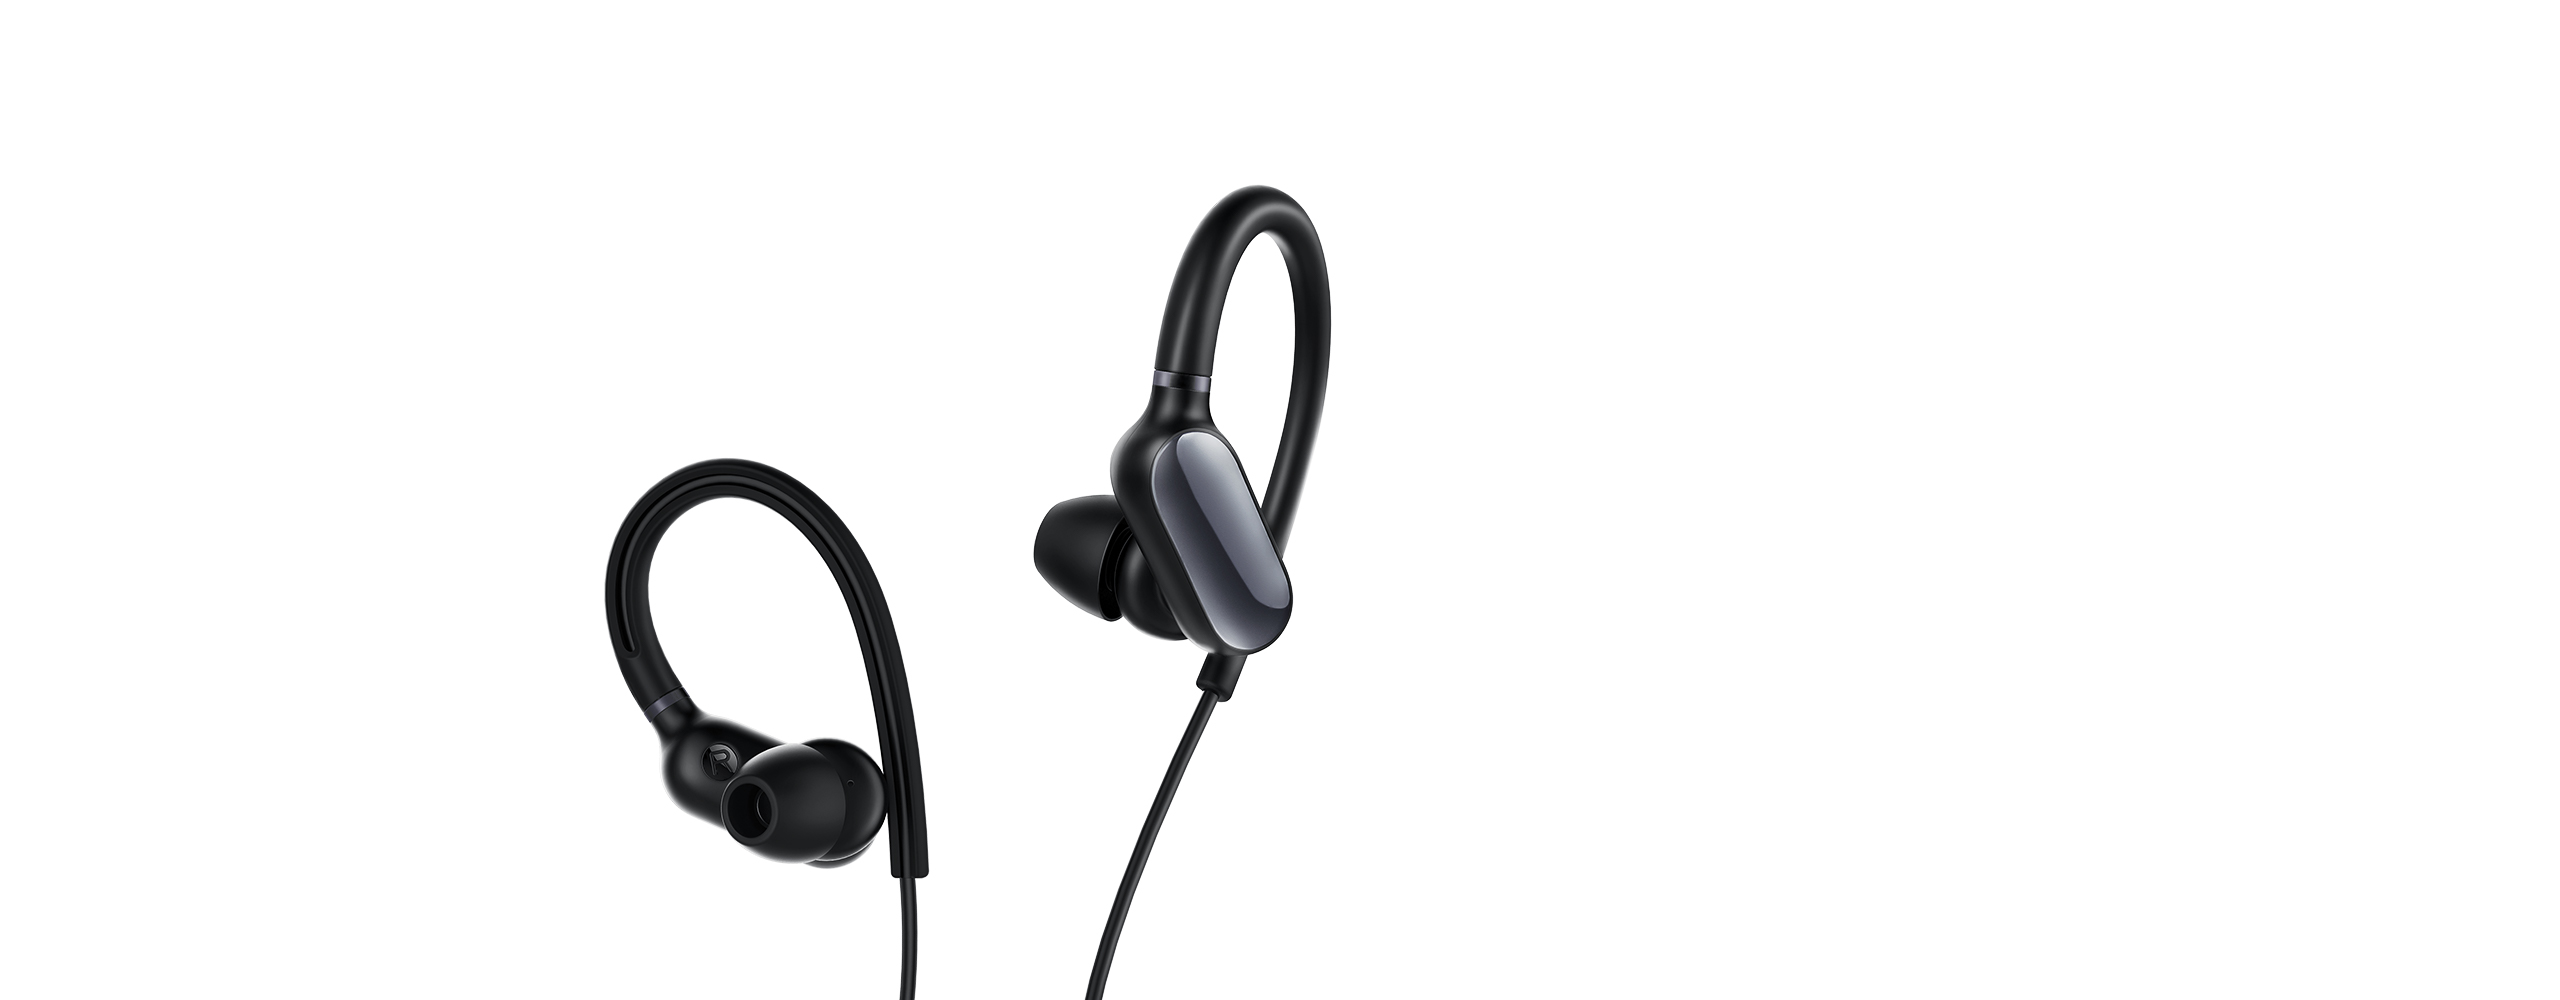 39dfa84a66a Mi Sports Bluetooth Earphones mini - Xiaomi United States